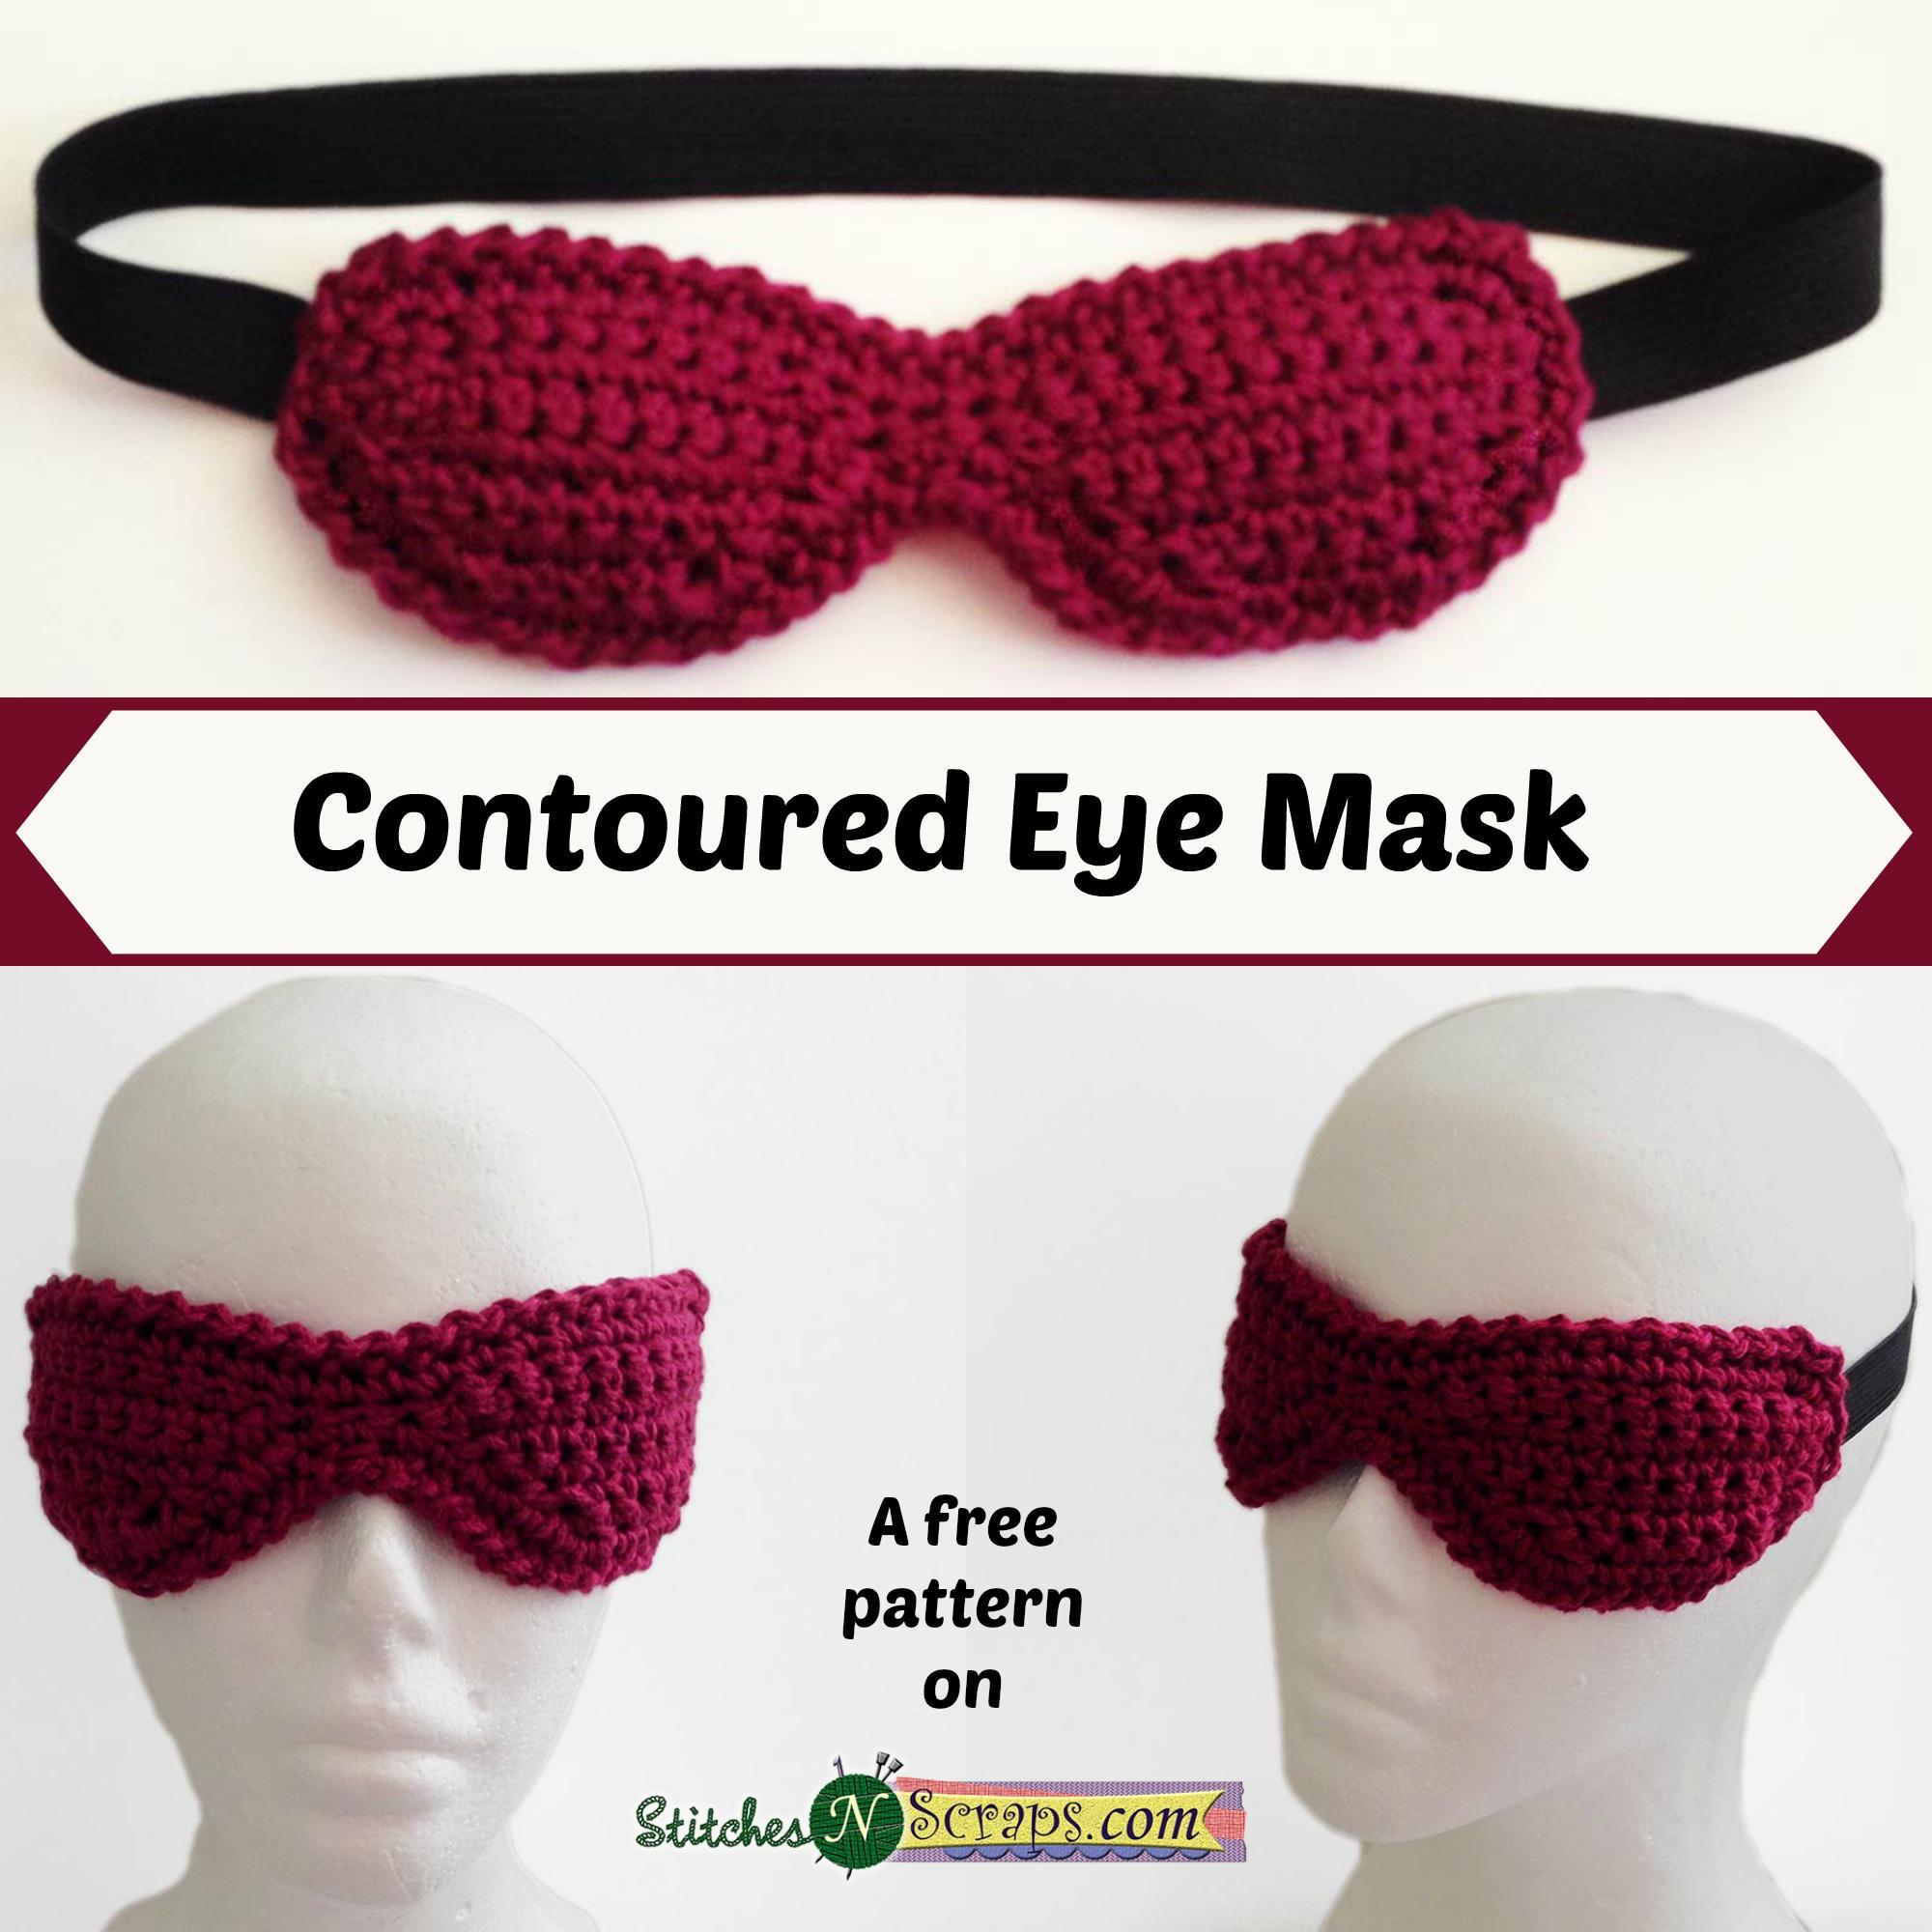 Free Pattern - Contoured Eye Mask - Stitches n Scraps